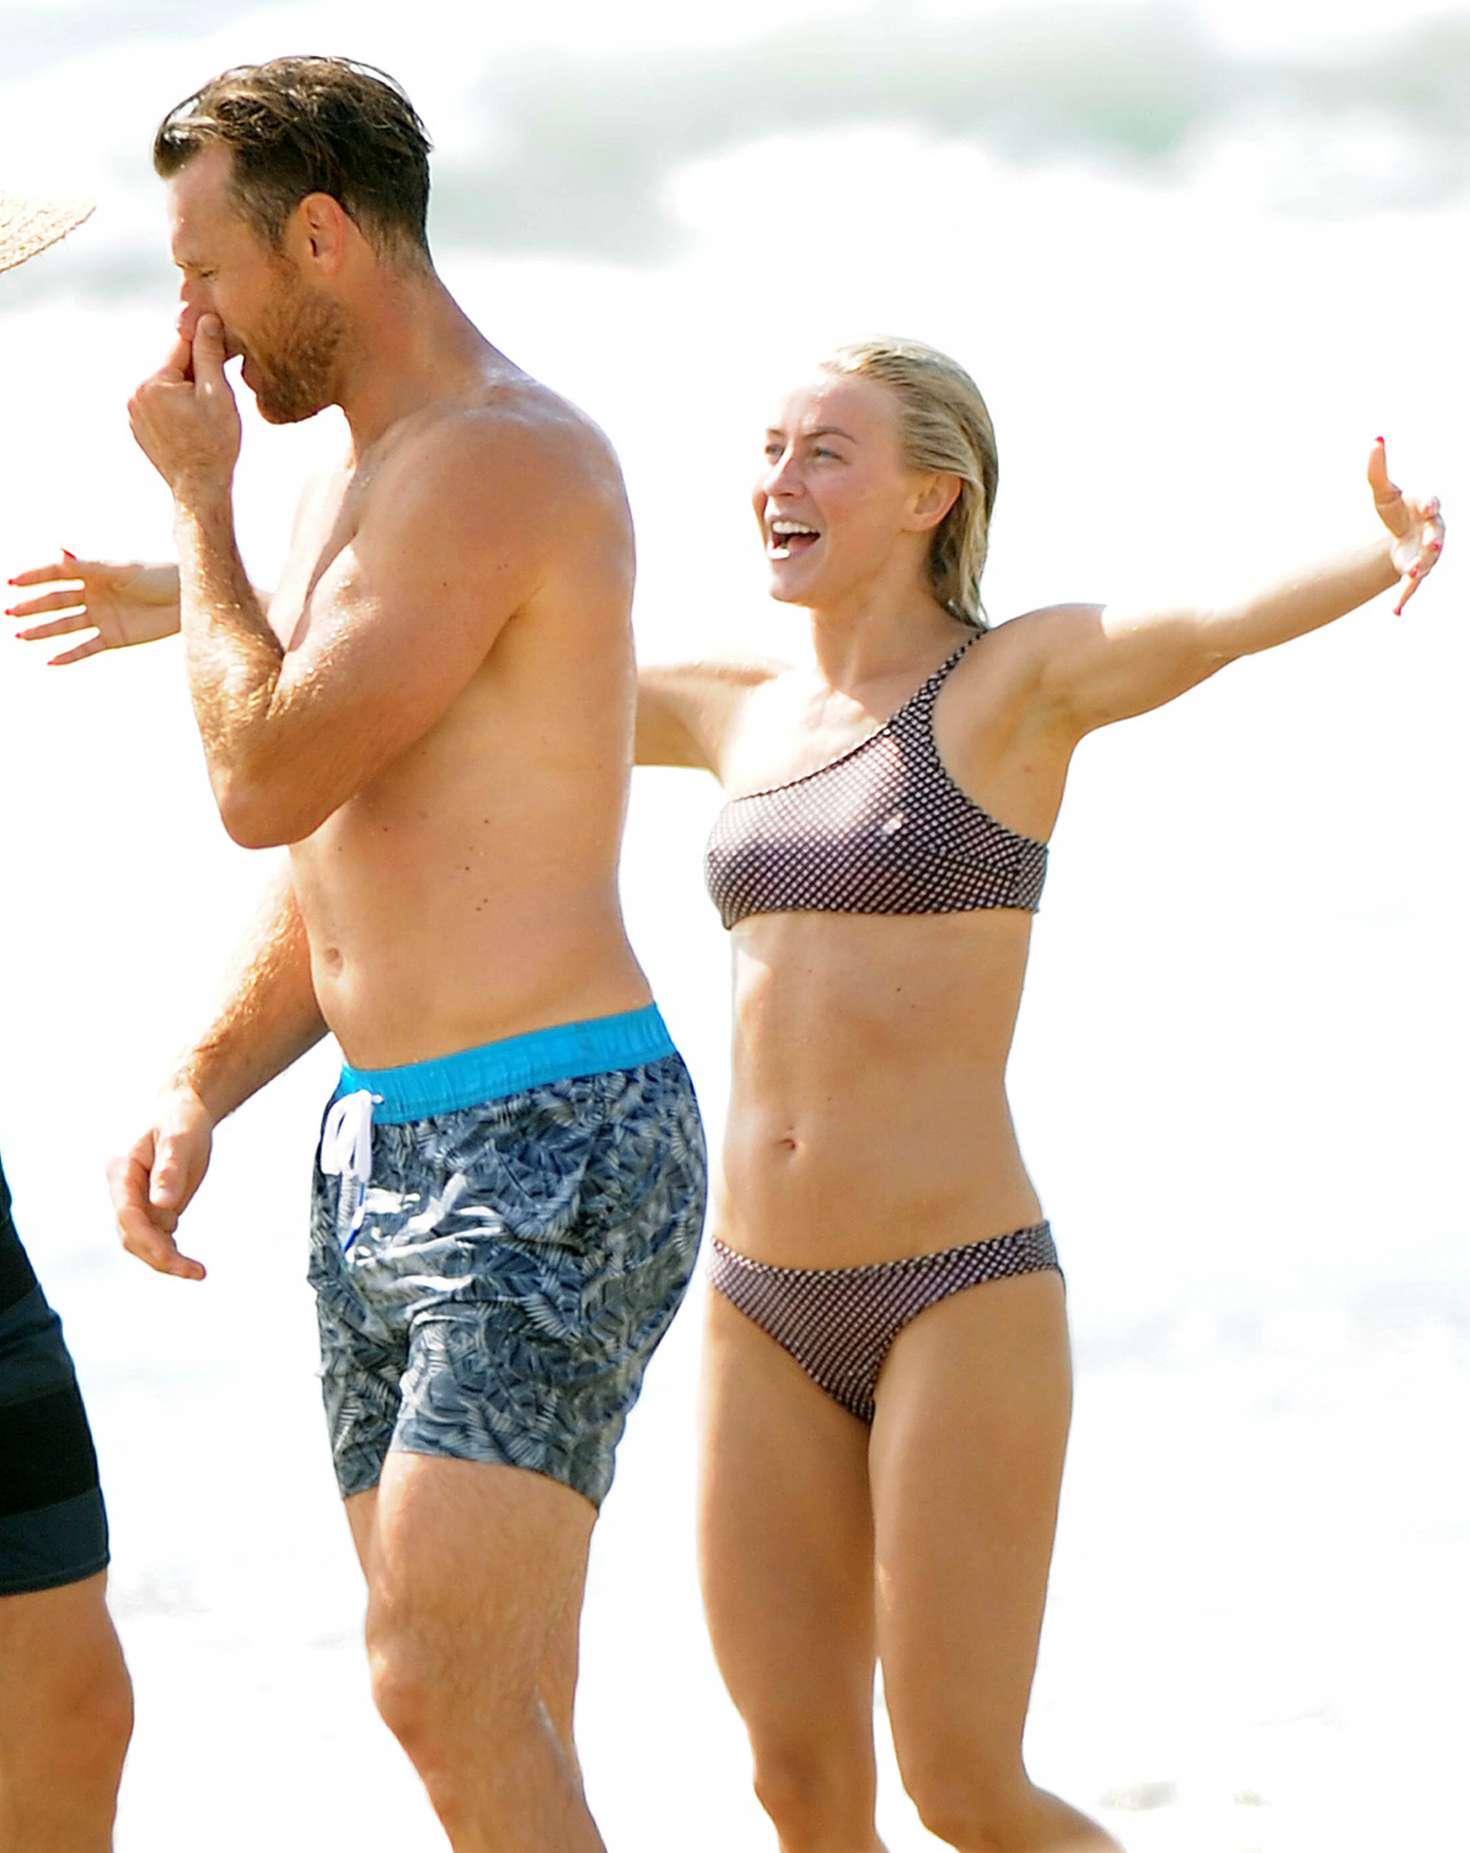 Julianne Hough 2017 : Julianne Hough: Bikini with husband Brooks Laich at the beach in Manhattan Beach-25